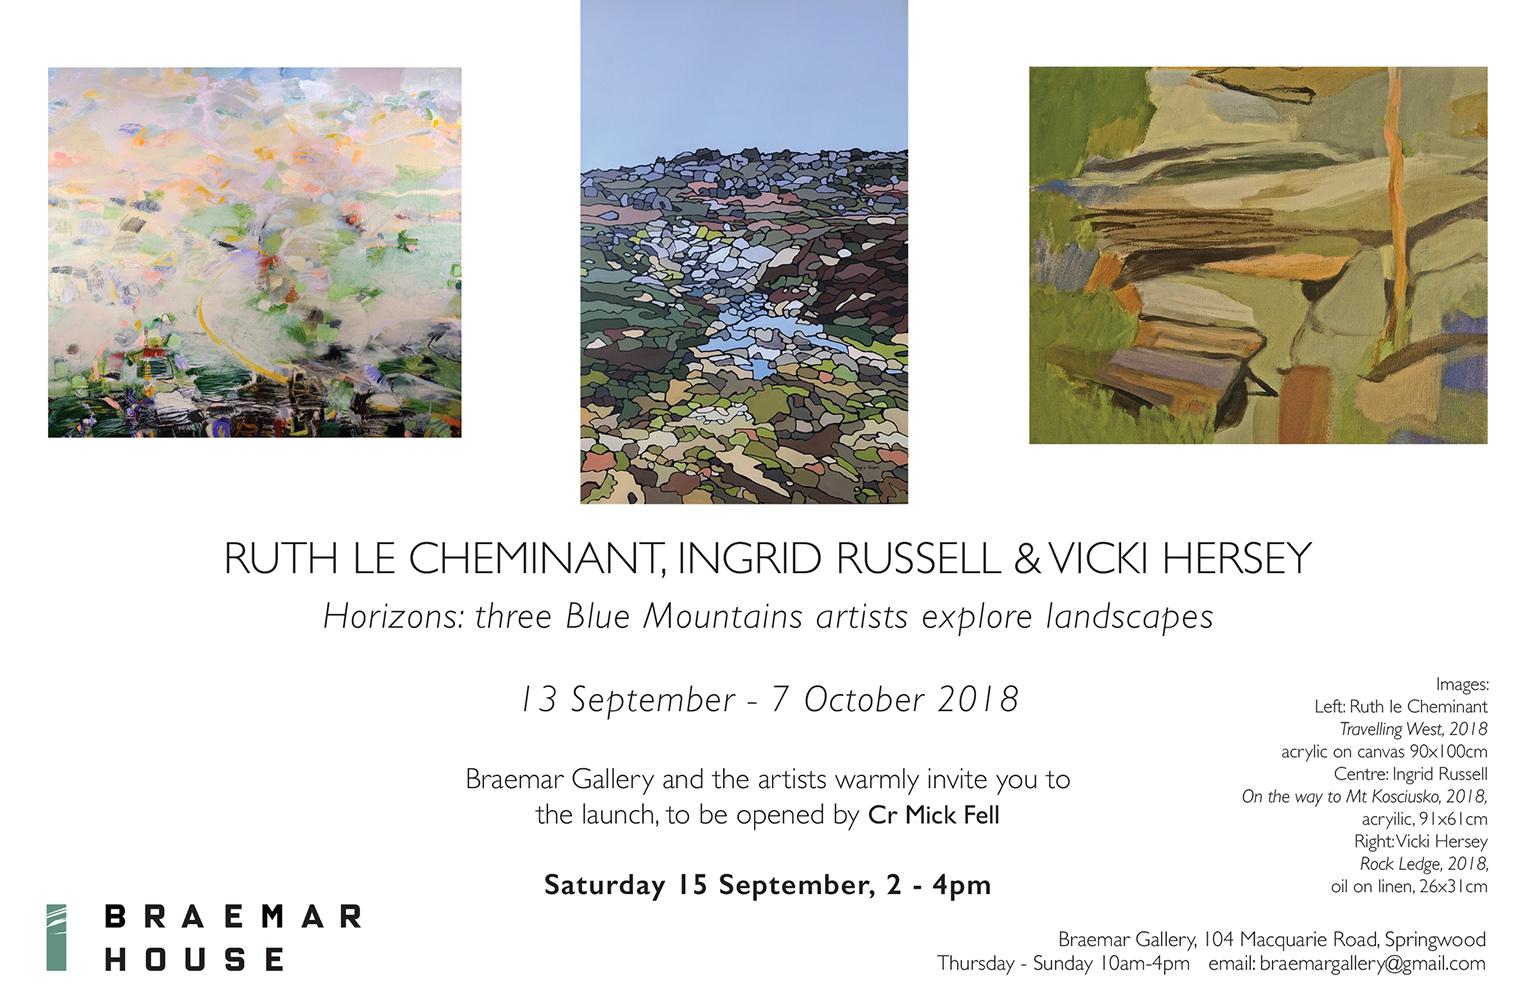 Ruth le Cheminant Horizons Braemar Gallery invitation opening 15 September 2018